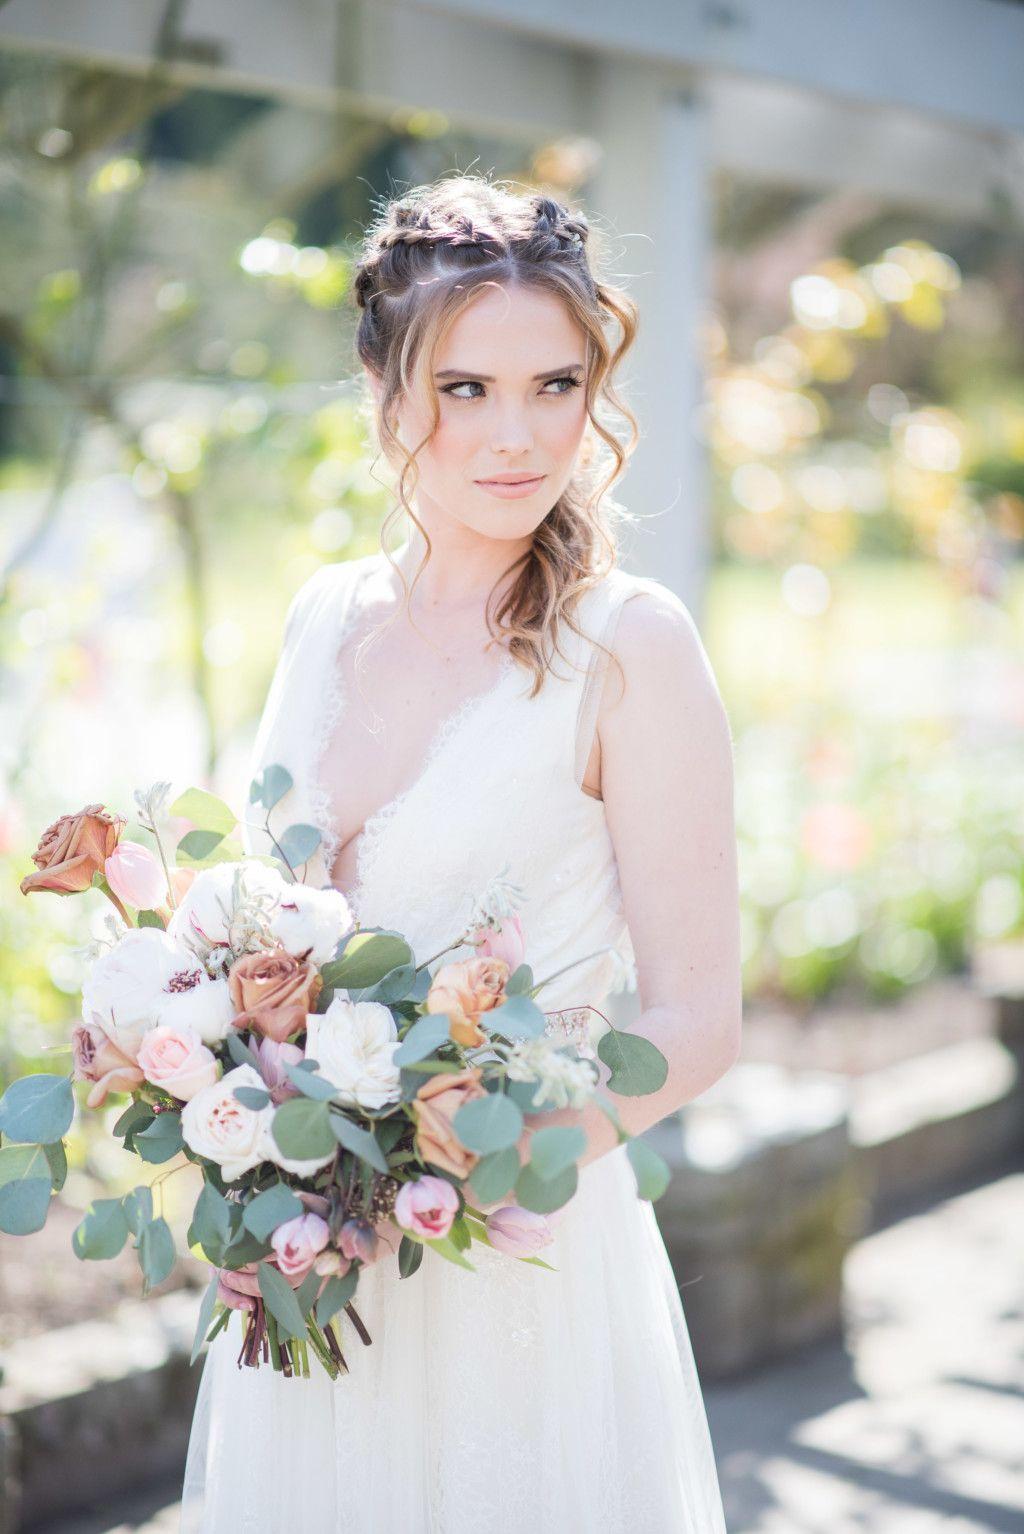 Natural Bridal Bouquet in 2020 Natural bridal bouquet